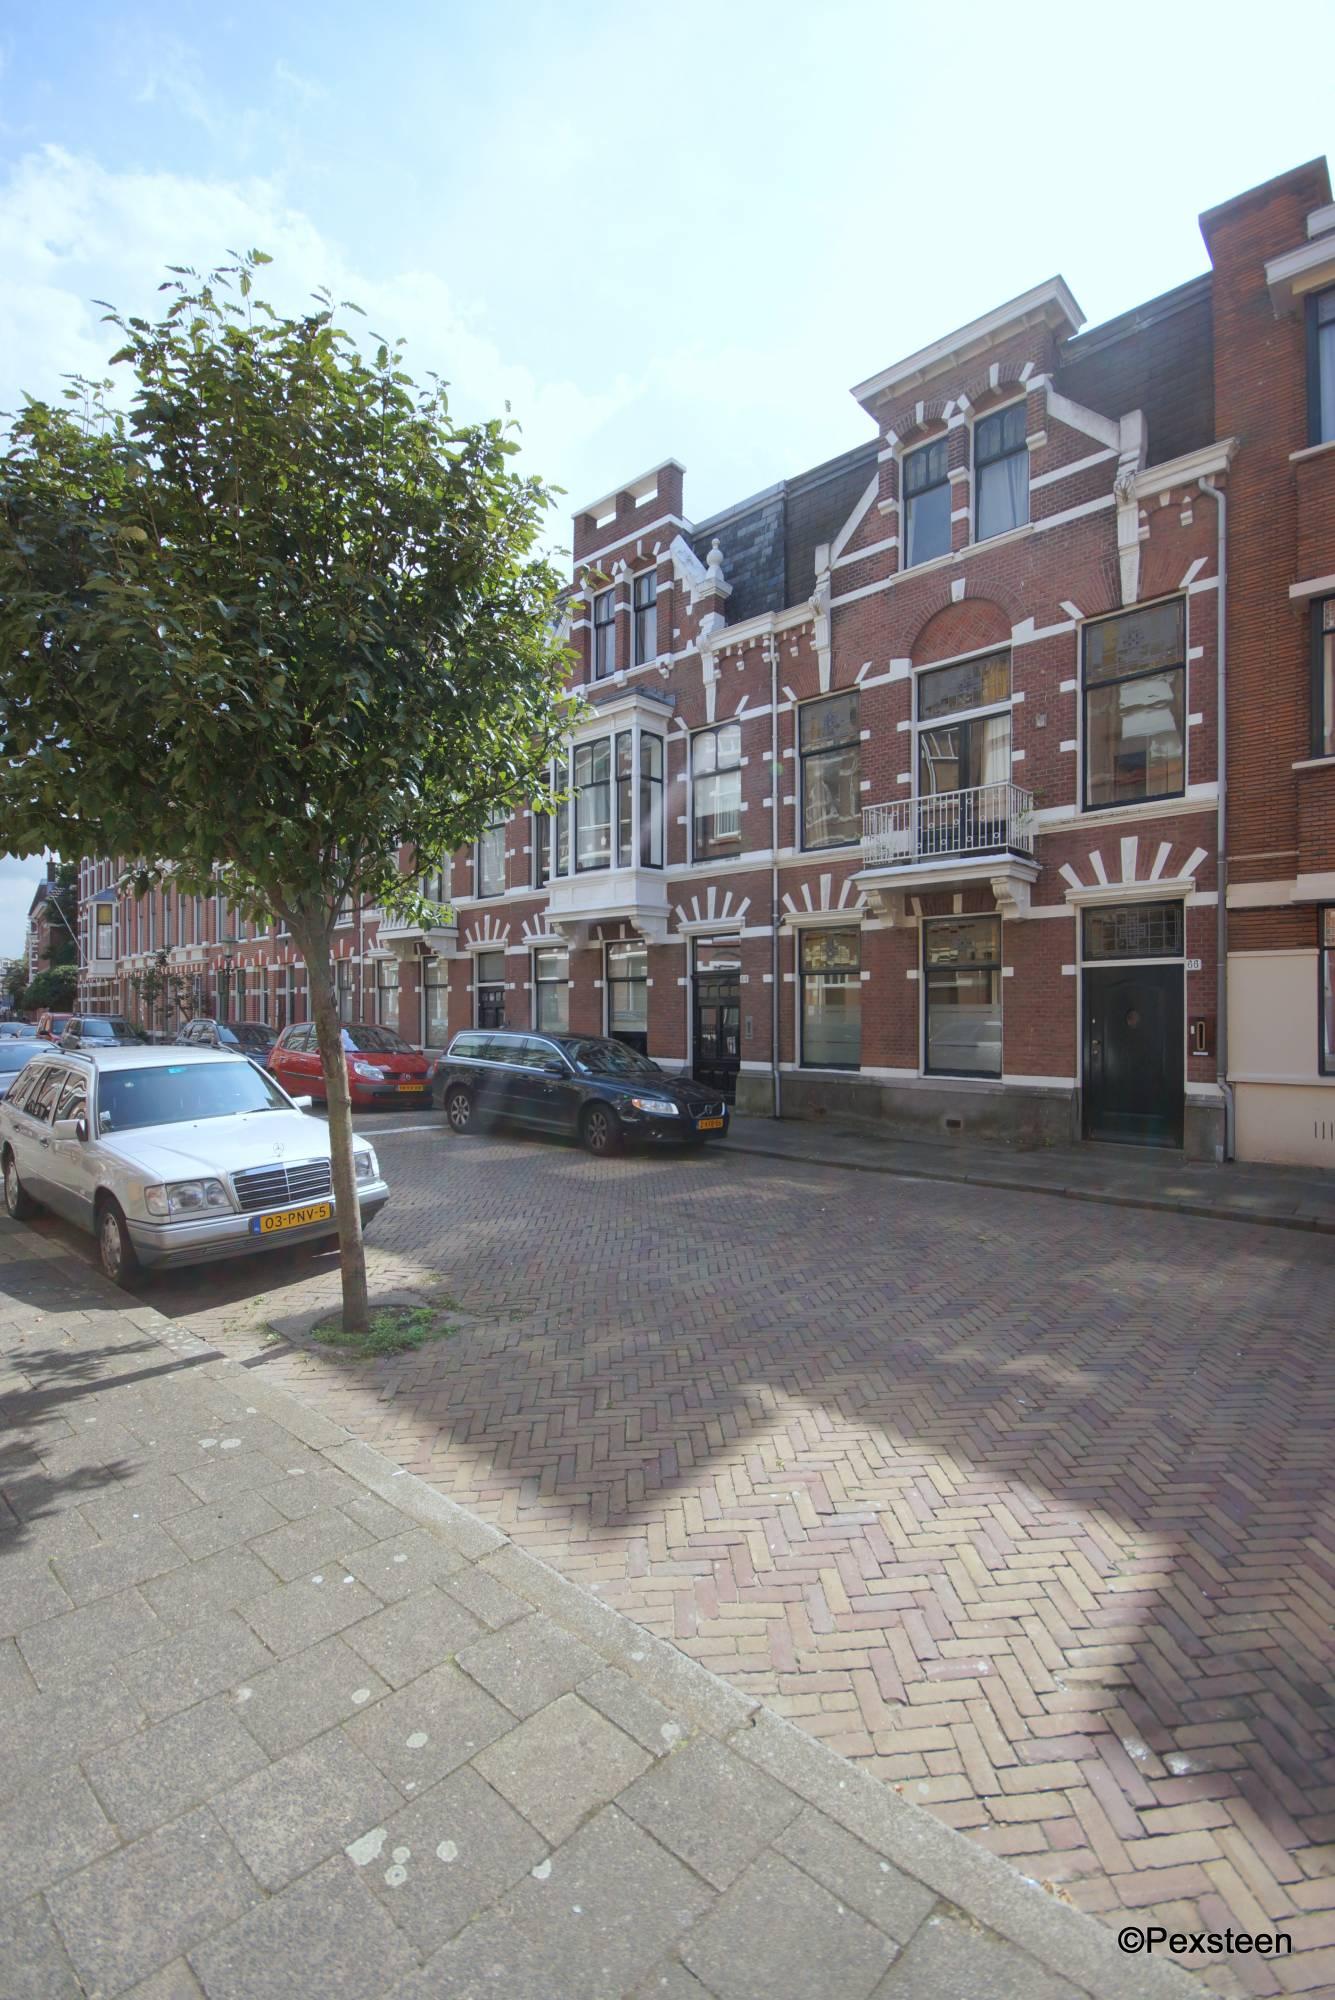 https://public.parariusoffice.nl/185/photos/huge/2346928.1379406276-583.JPG